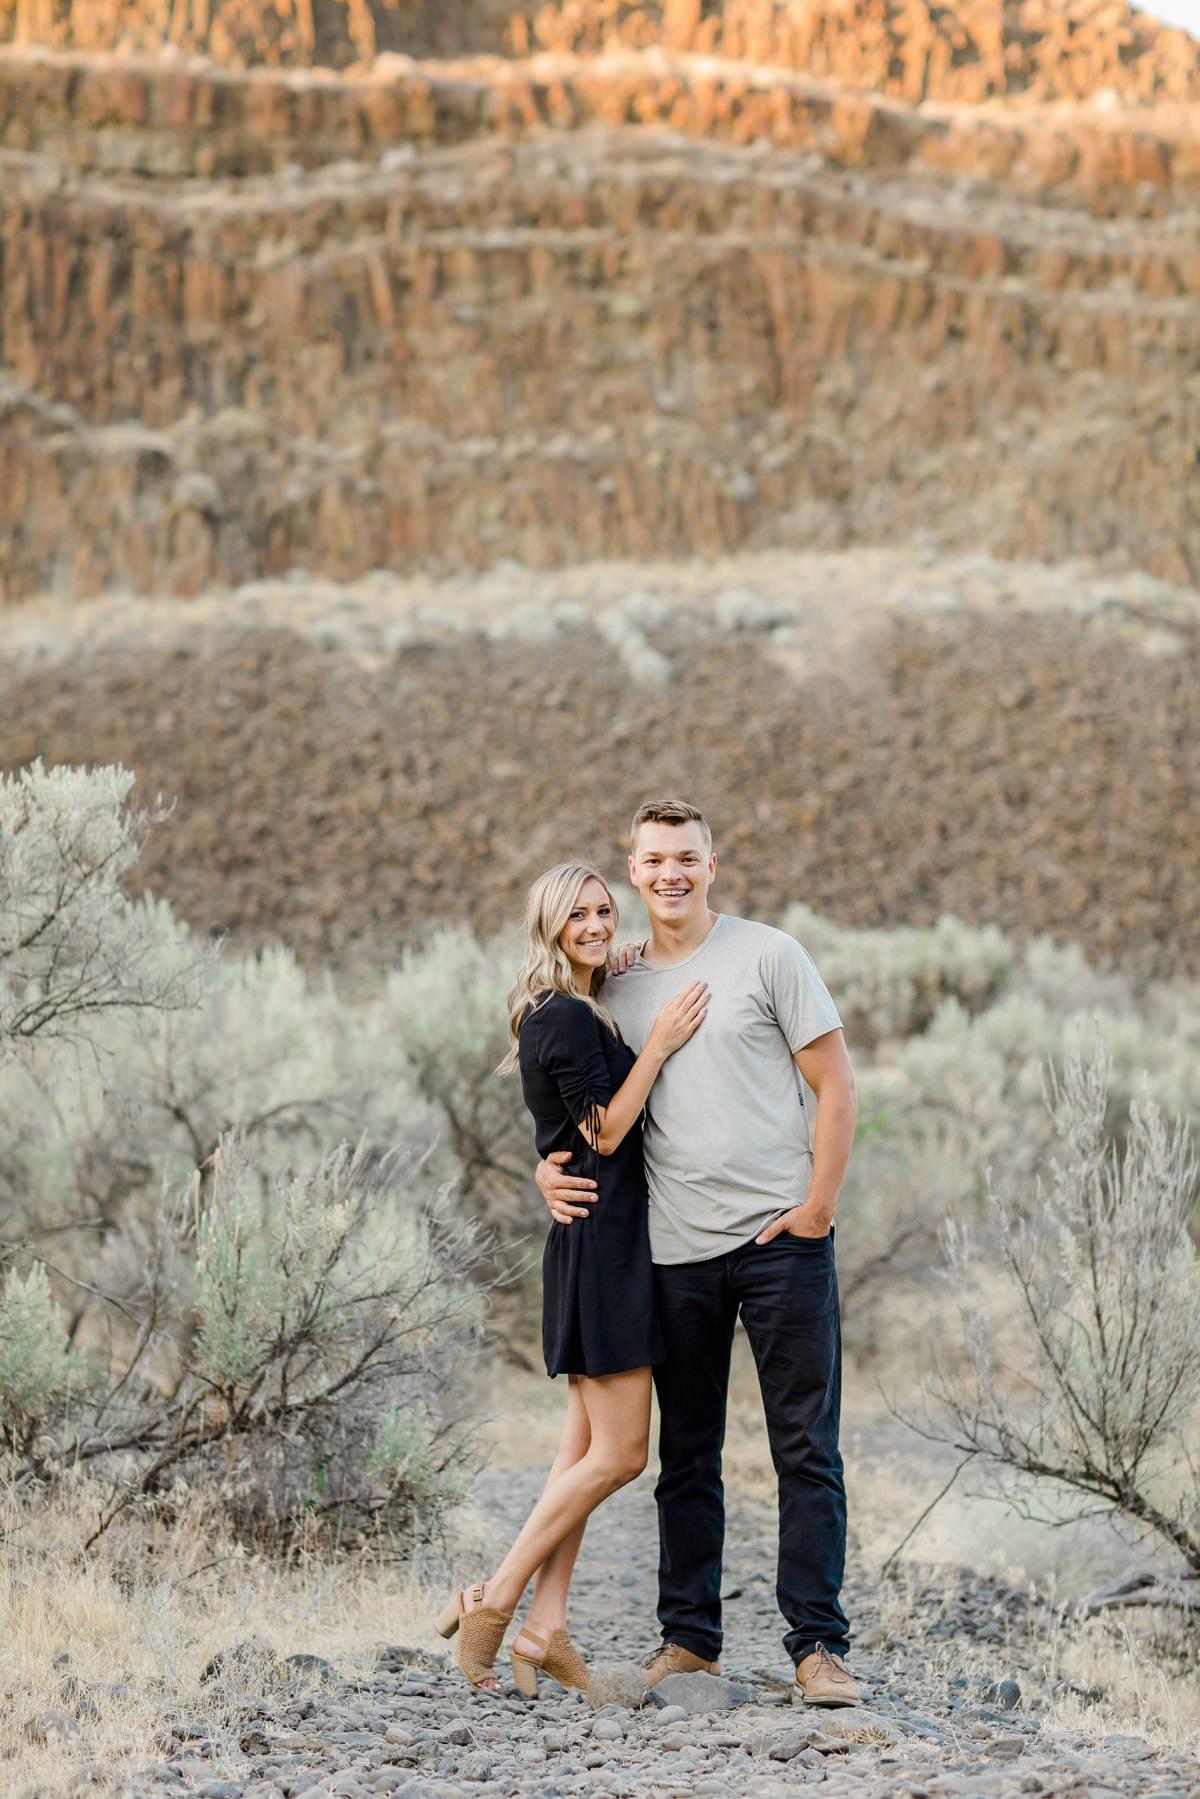 Spokane wedding photographer Oxana Brik